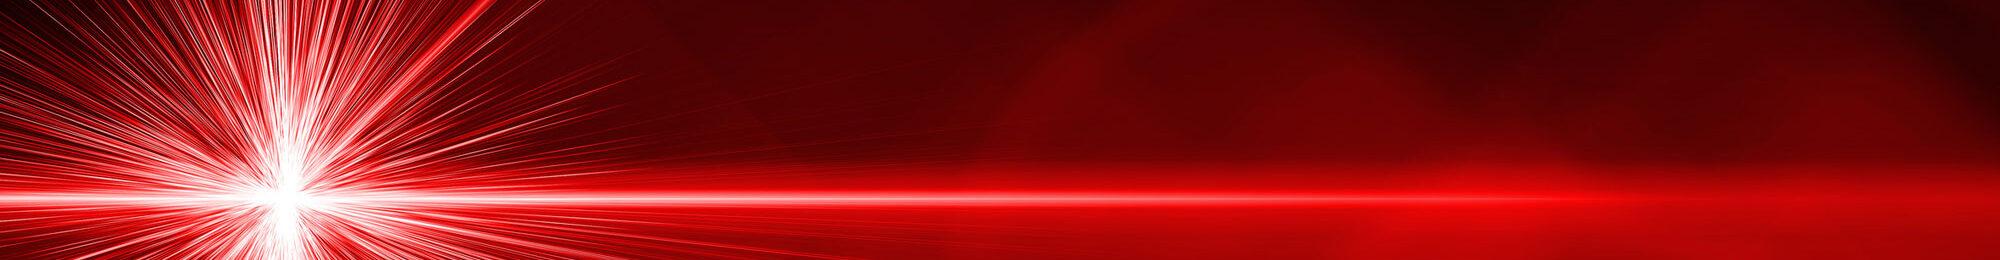 redbots-banner-agile-projektmethoden